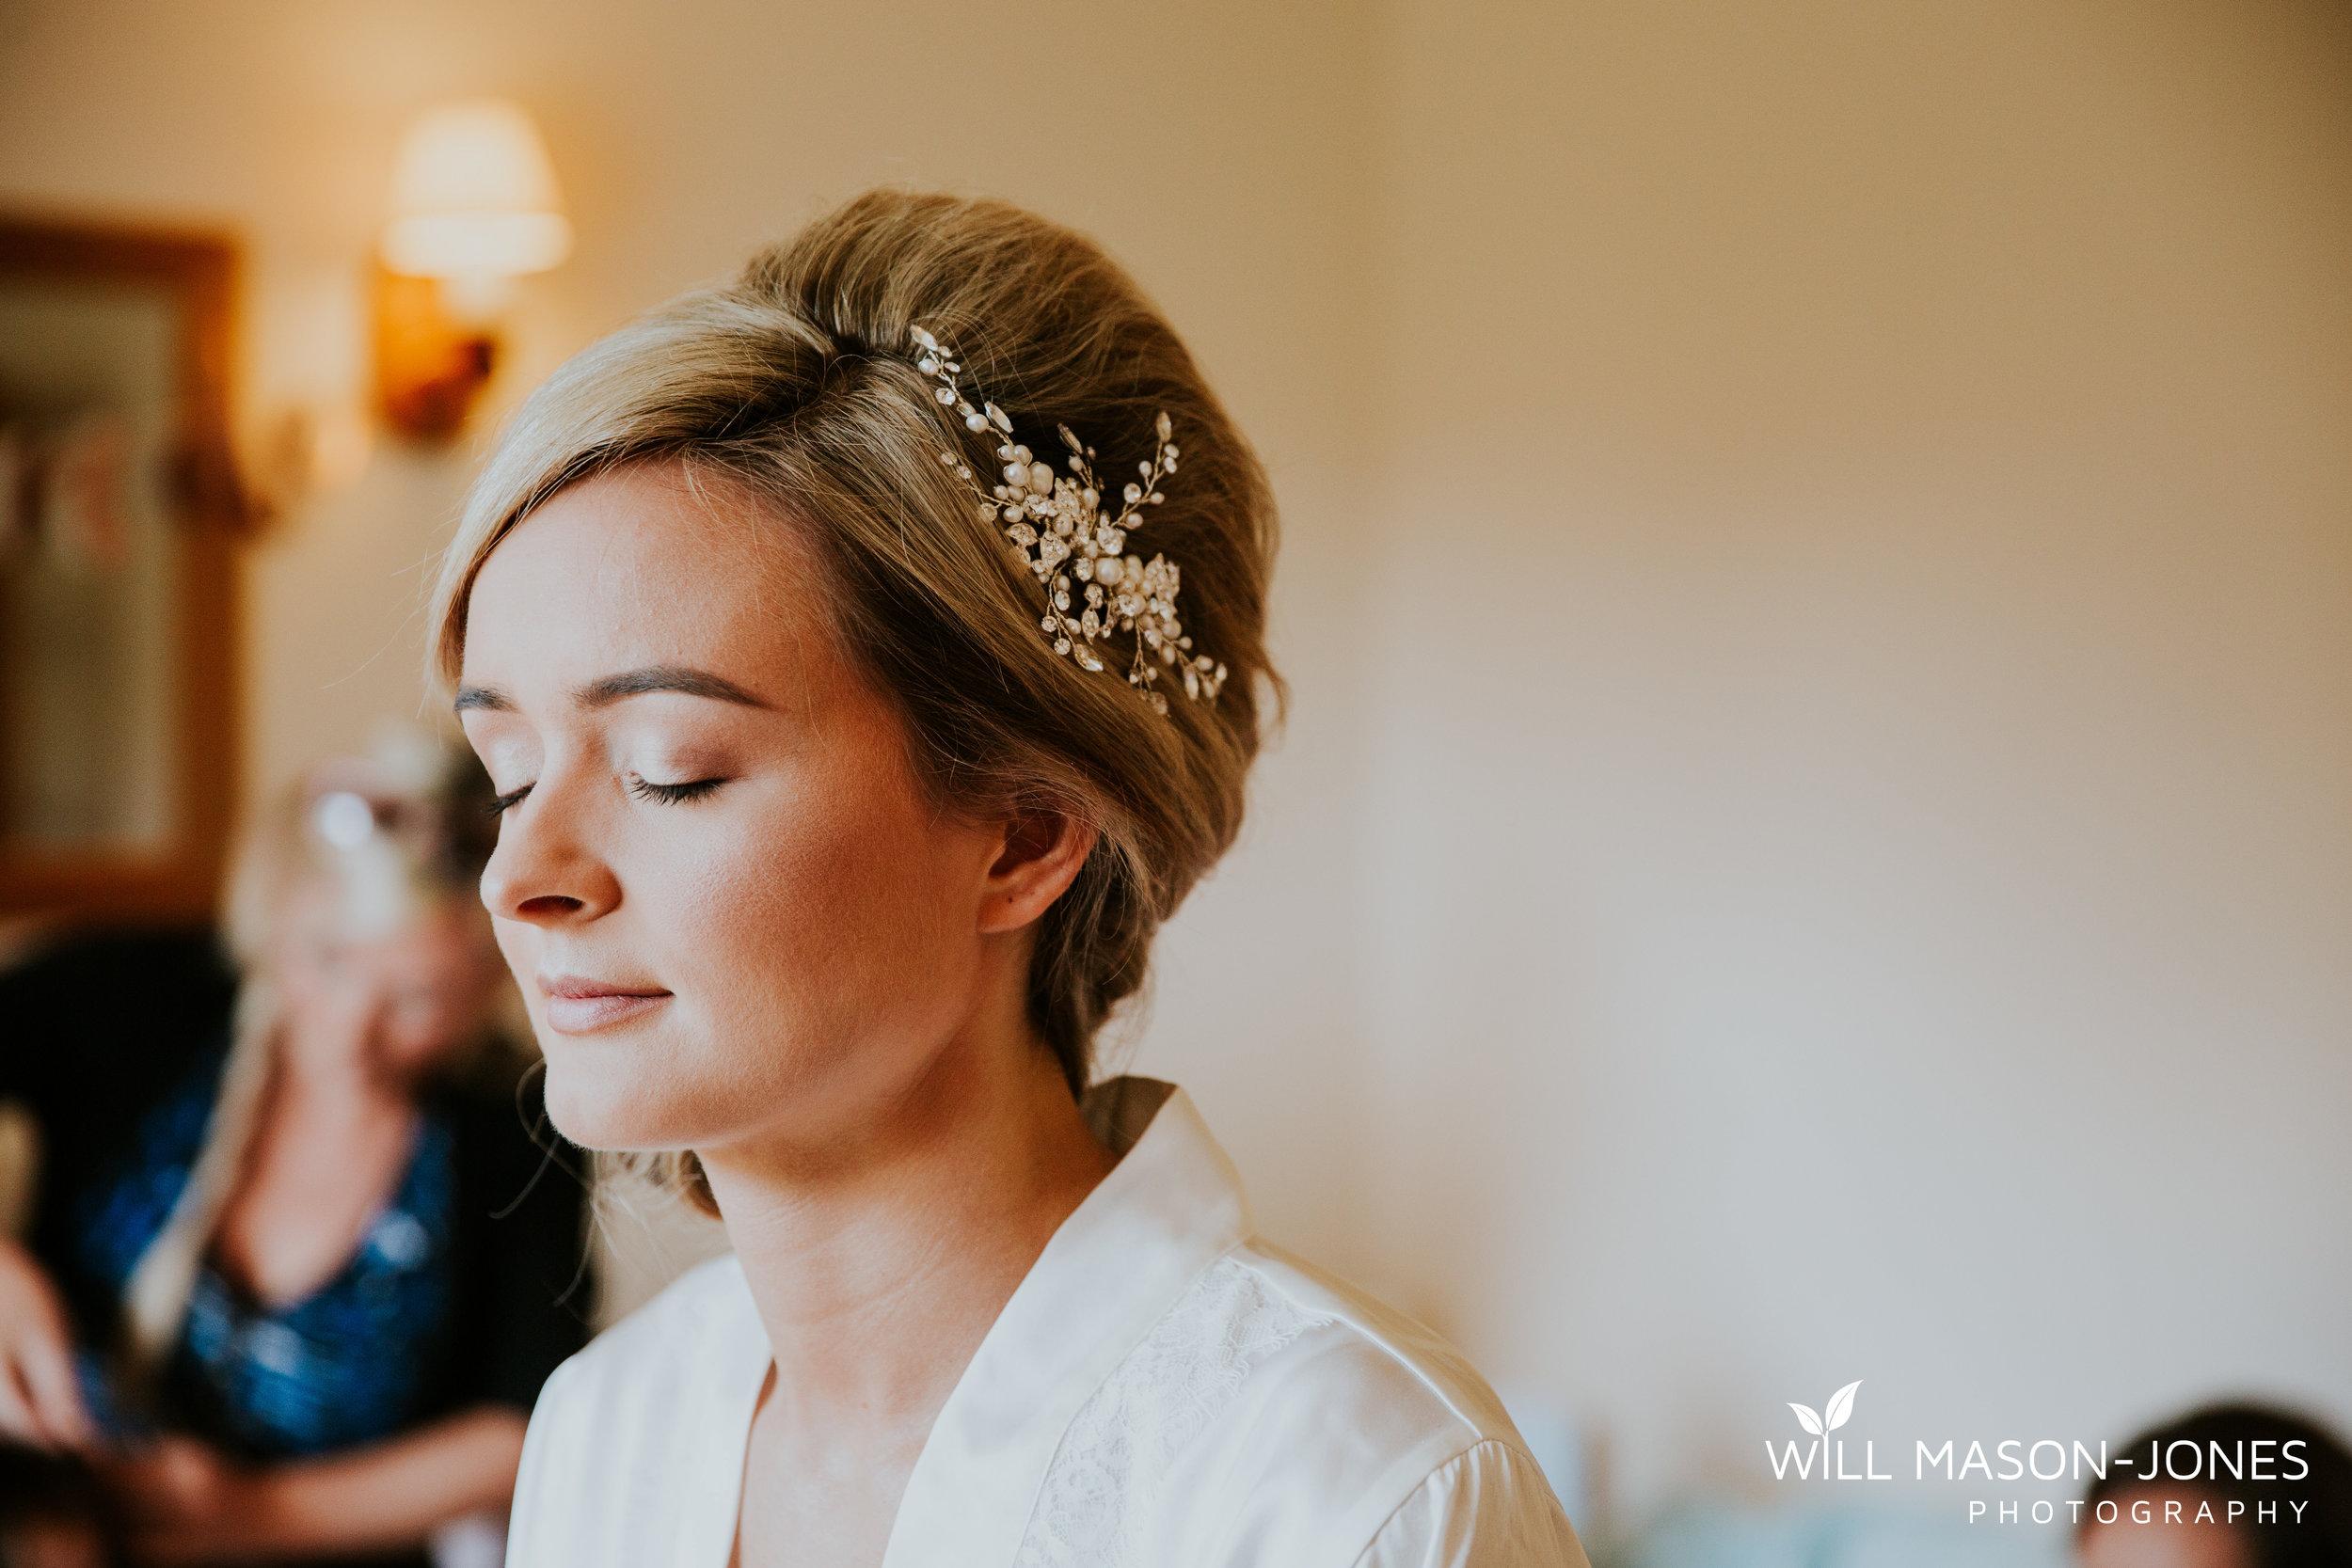 loch-lomond-destination-wedding-photographer-scotland-uk-wales-15.jpg